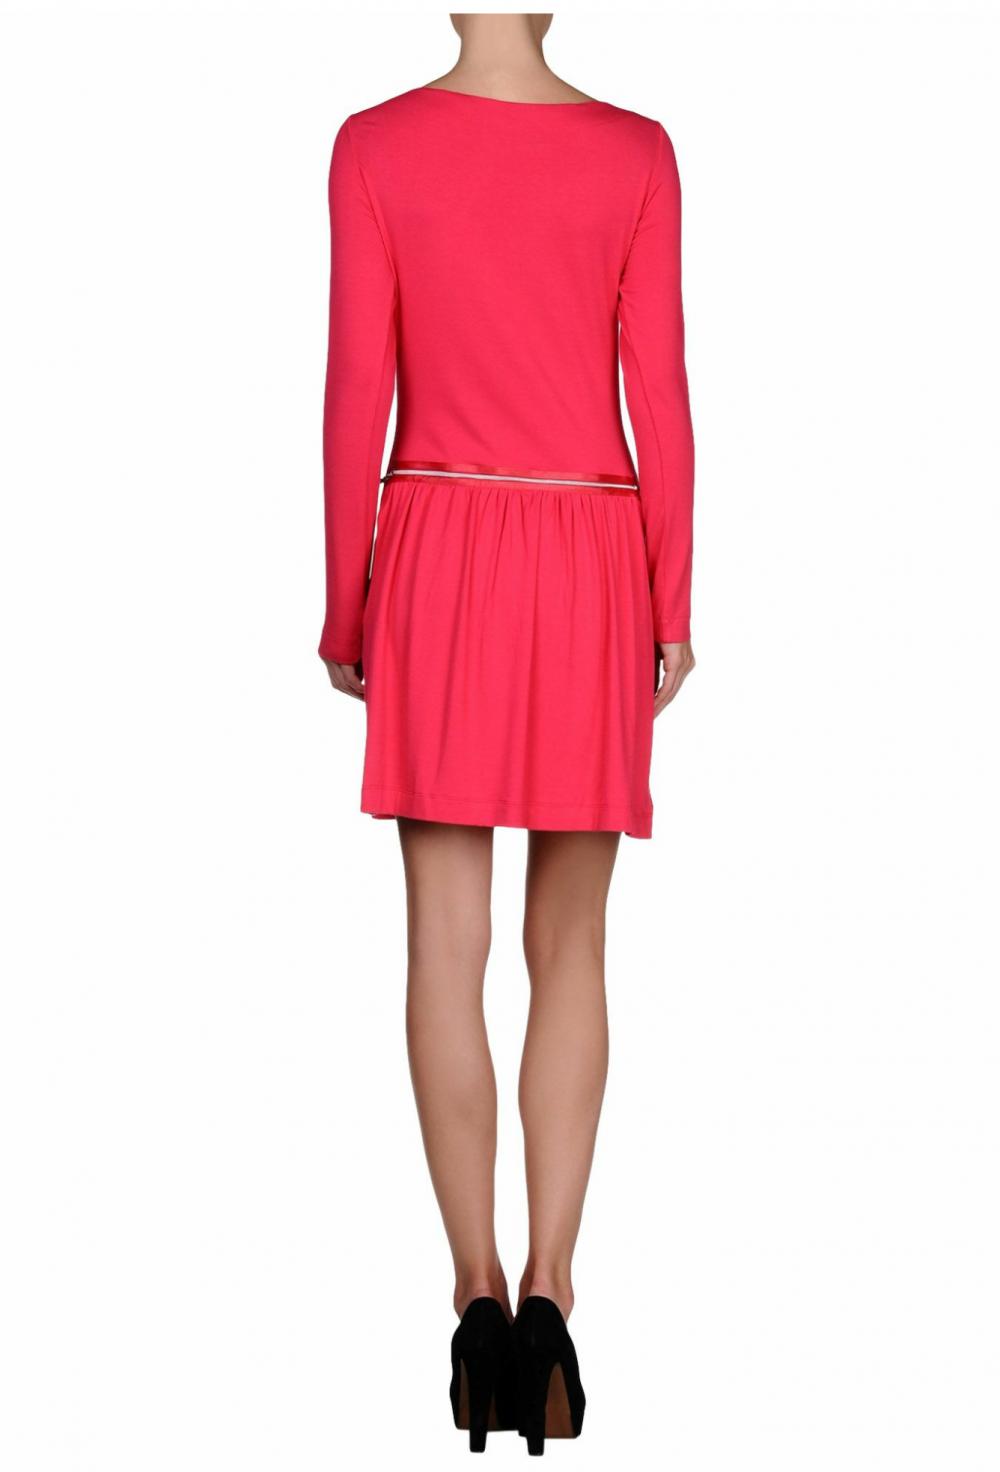 Платье LOVE MOSCHINO размер 42IT - 44-46(M)